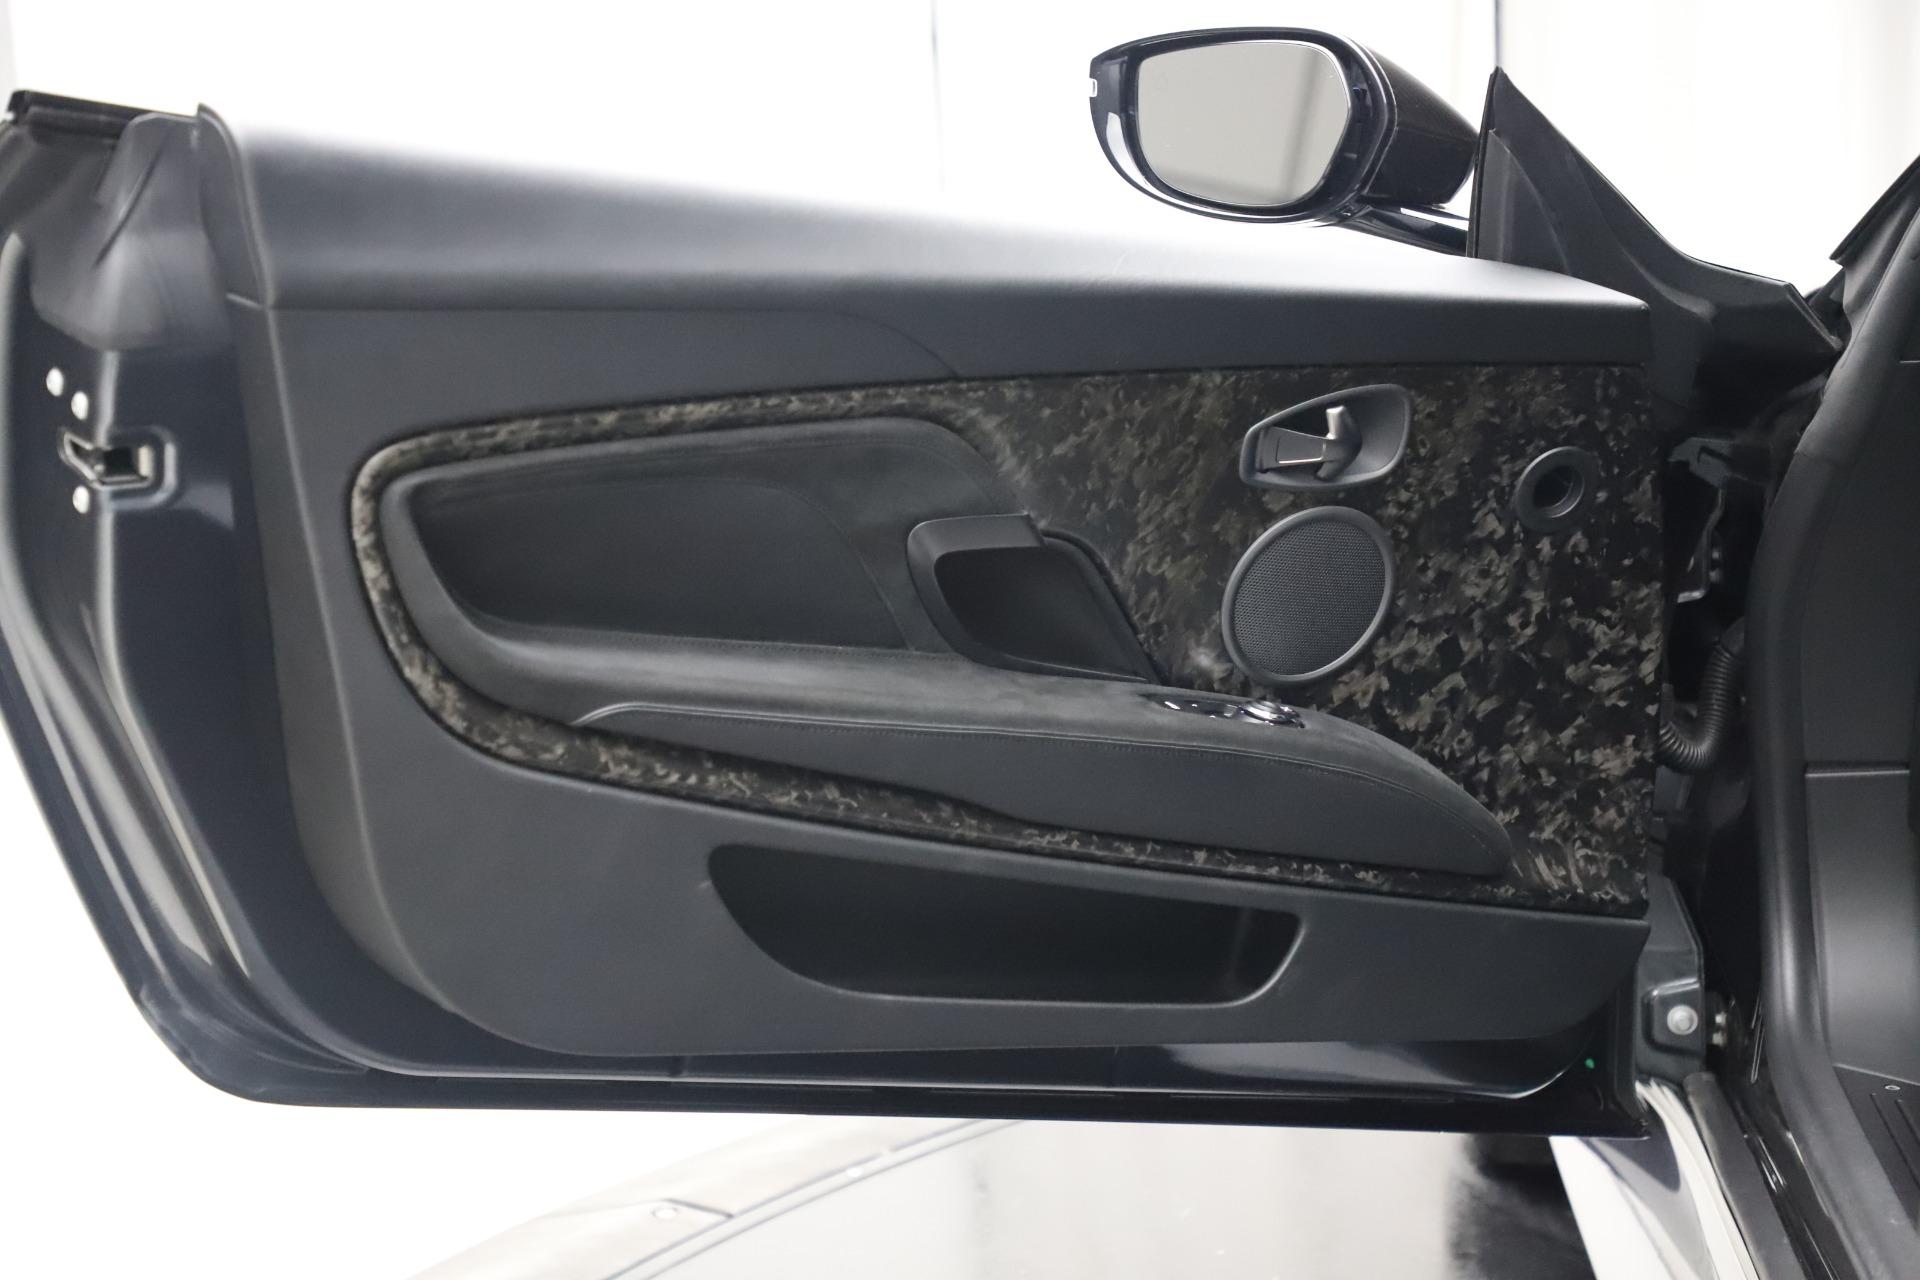 Used 2019 Aston Martin DBS Superleggera Coupe For Sale In Greenwich, CT. Alfa Romeo of Greenwich, A1438B 3570_p20